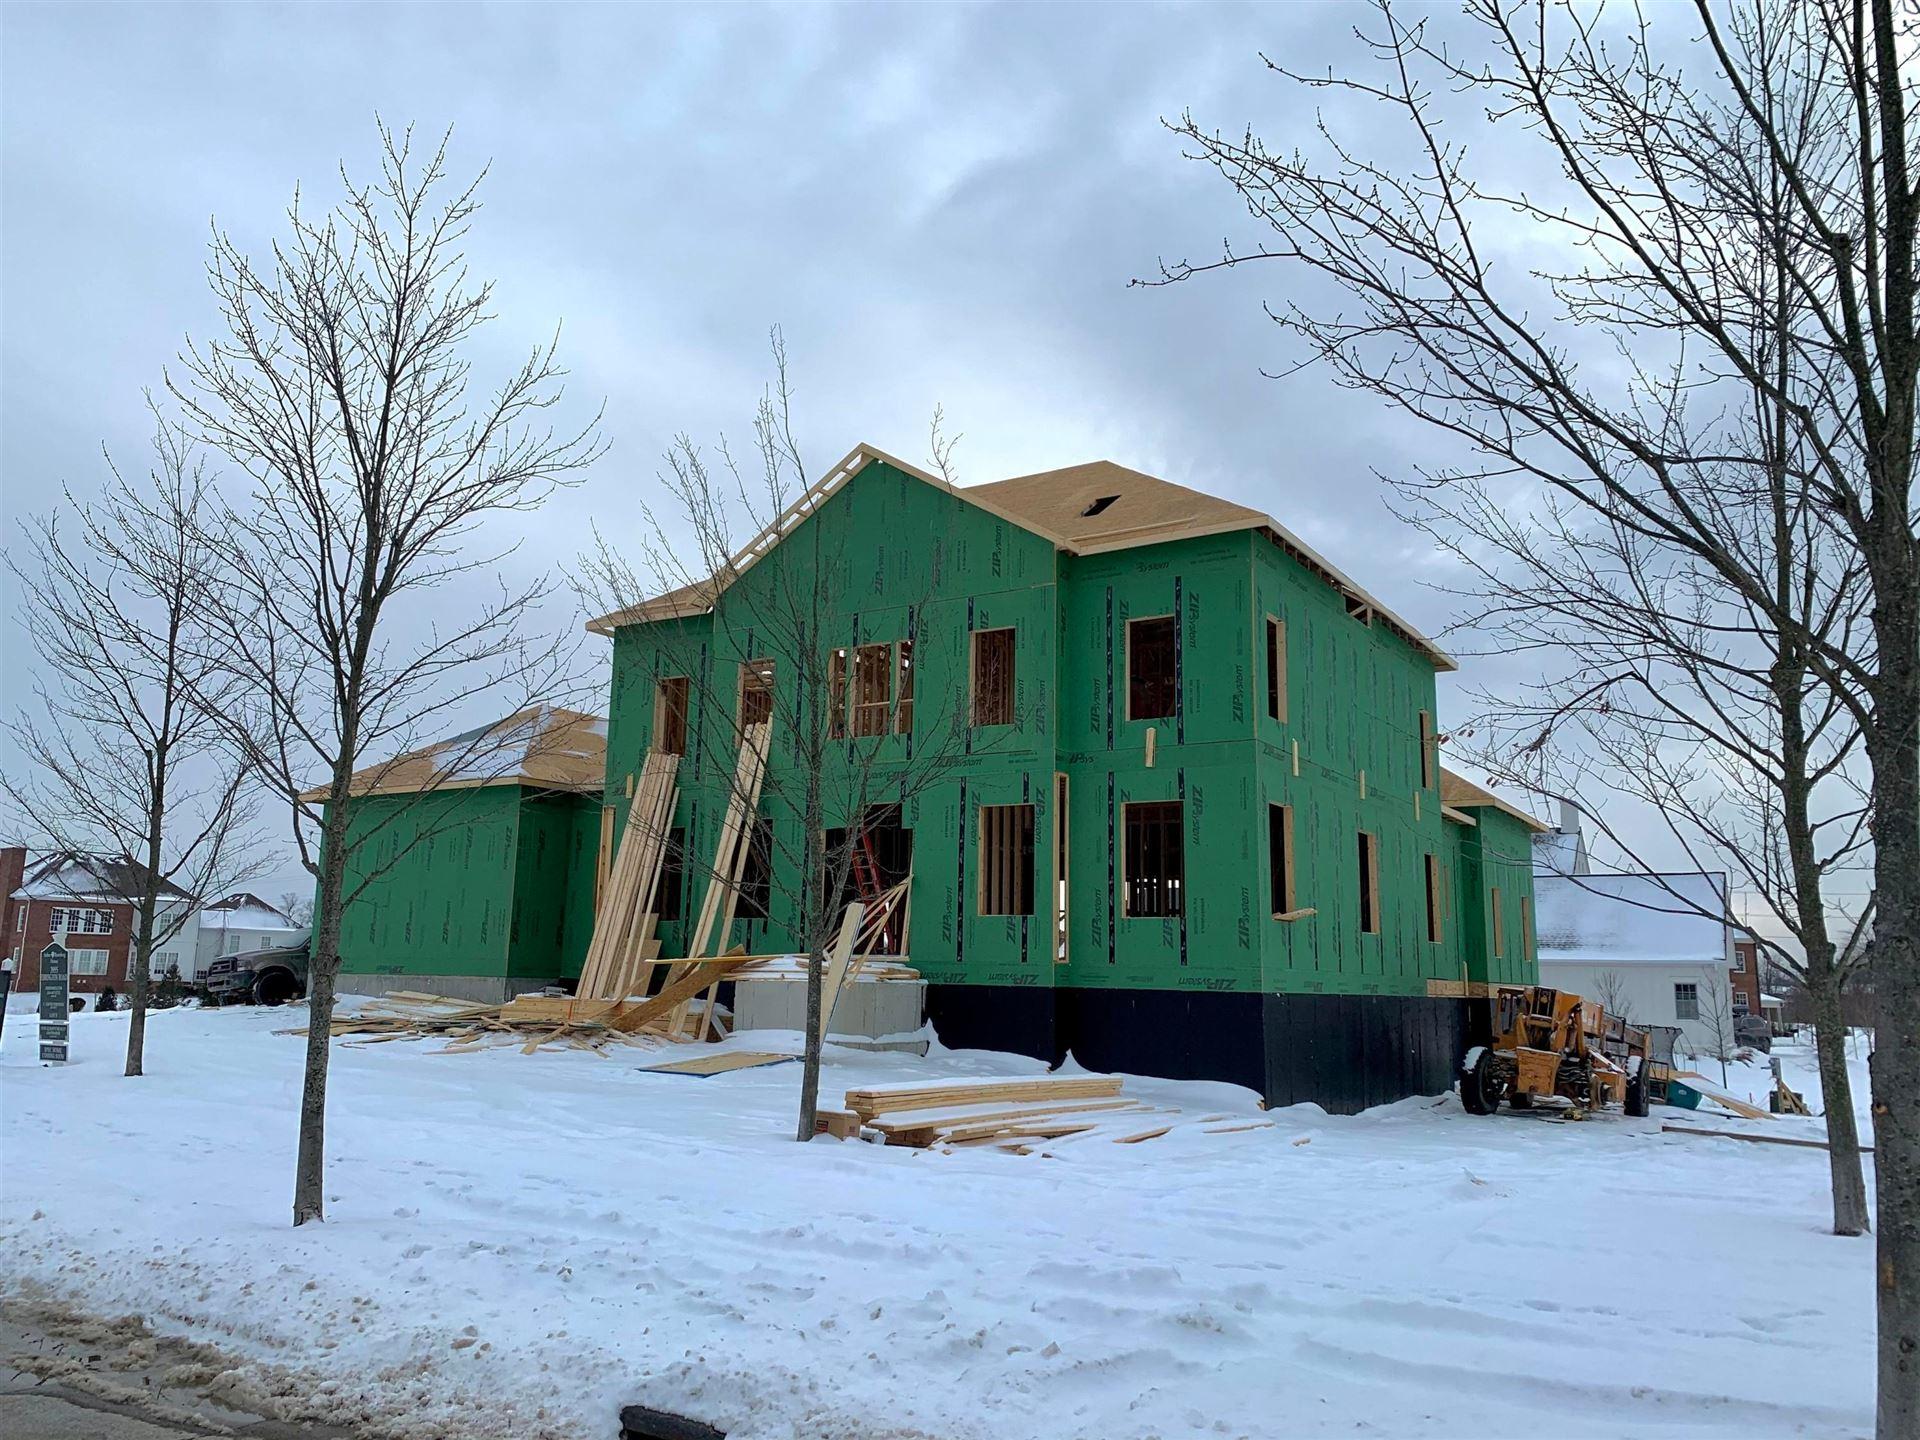 Photo for Lot 8 Ebrington Rd, New Albany, OH 43054 (MLS # 221003989)